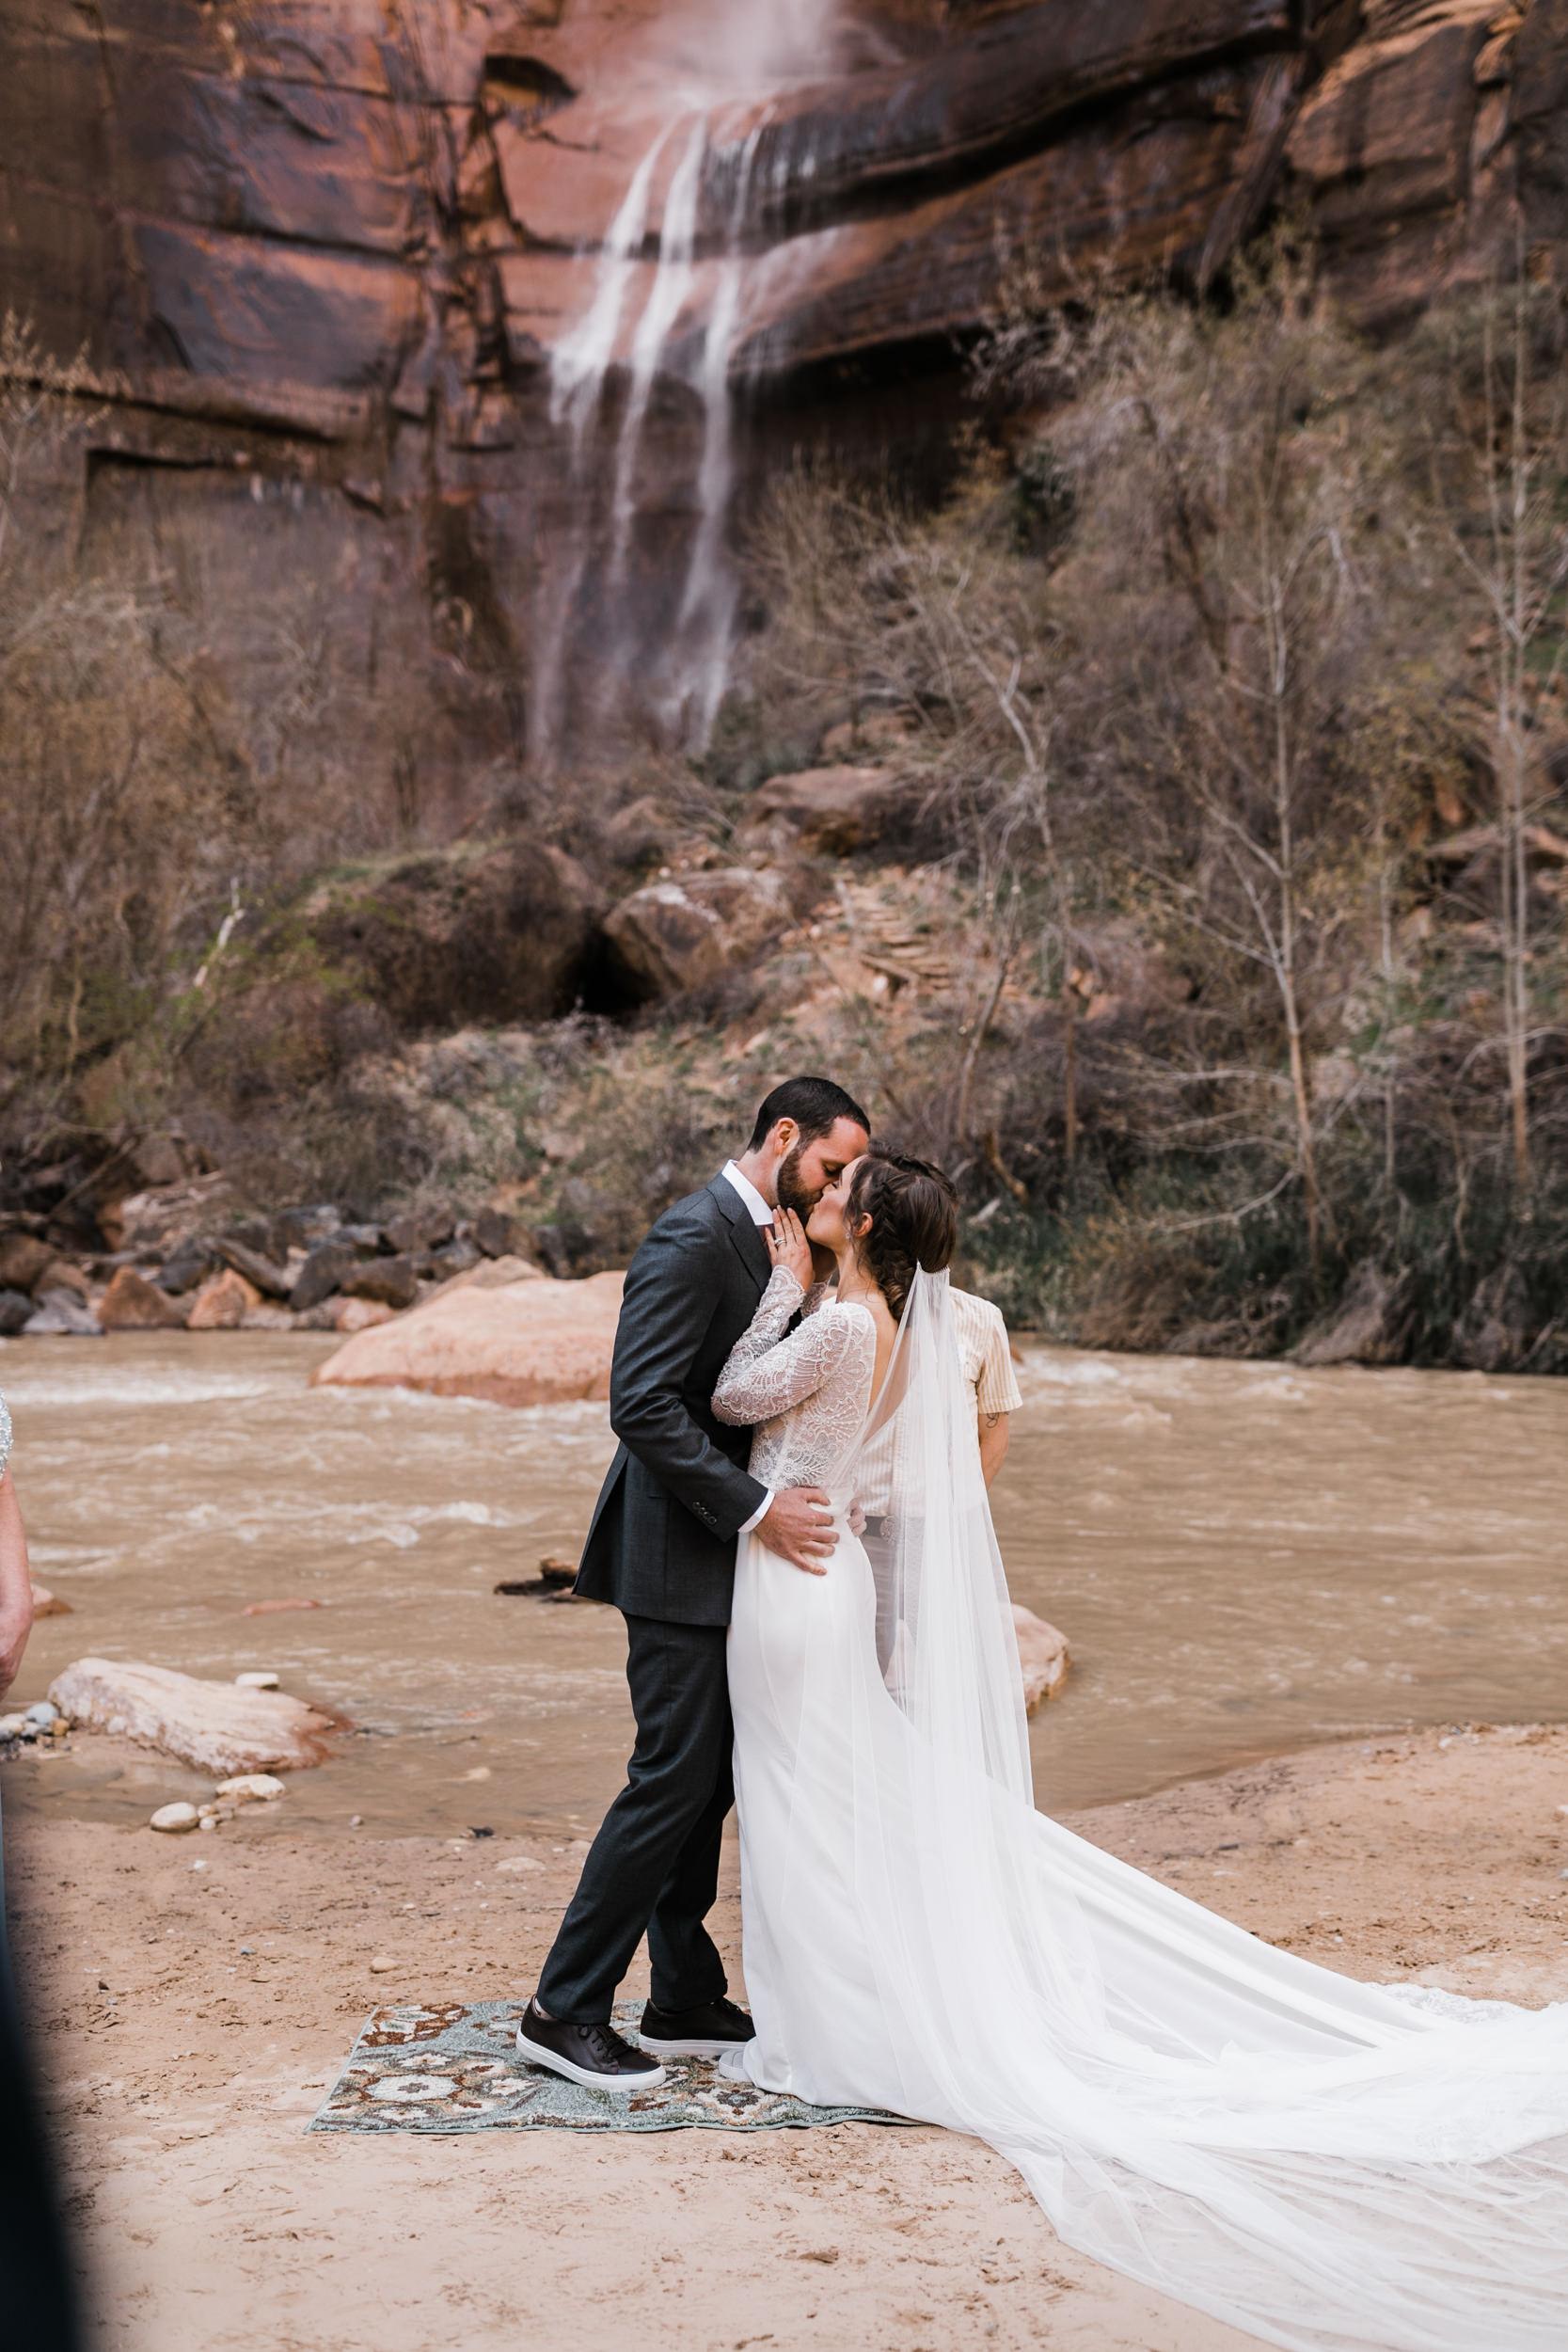 Zion-National-Park-Adventure-Wedding-Hearnes-Elopement-Photography-11.jpg